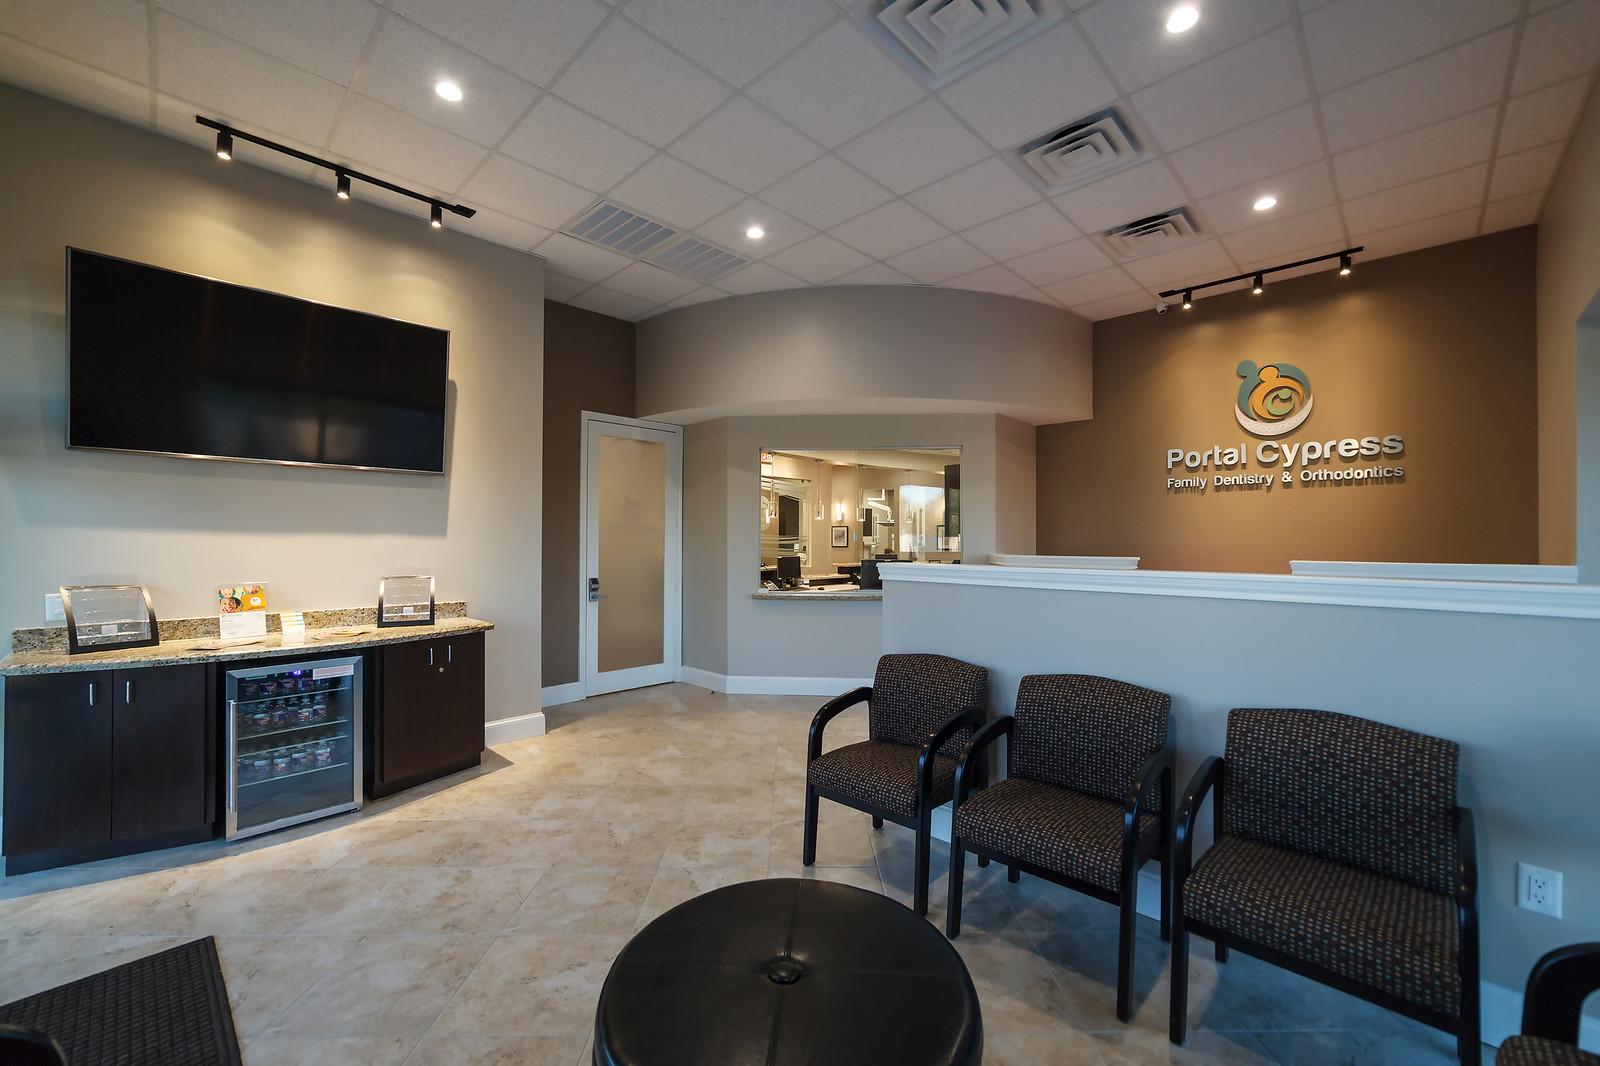 Portal-Cypress-Dentistry-houston texas